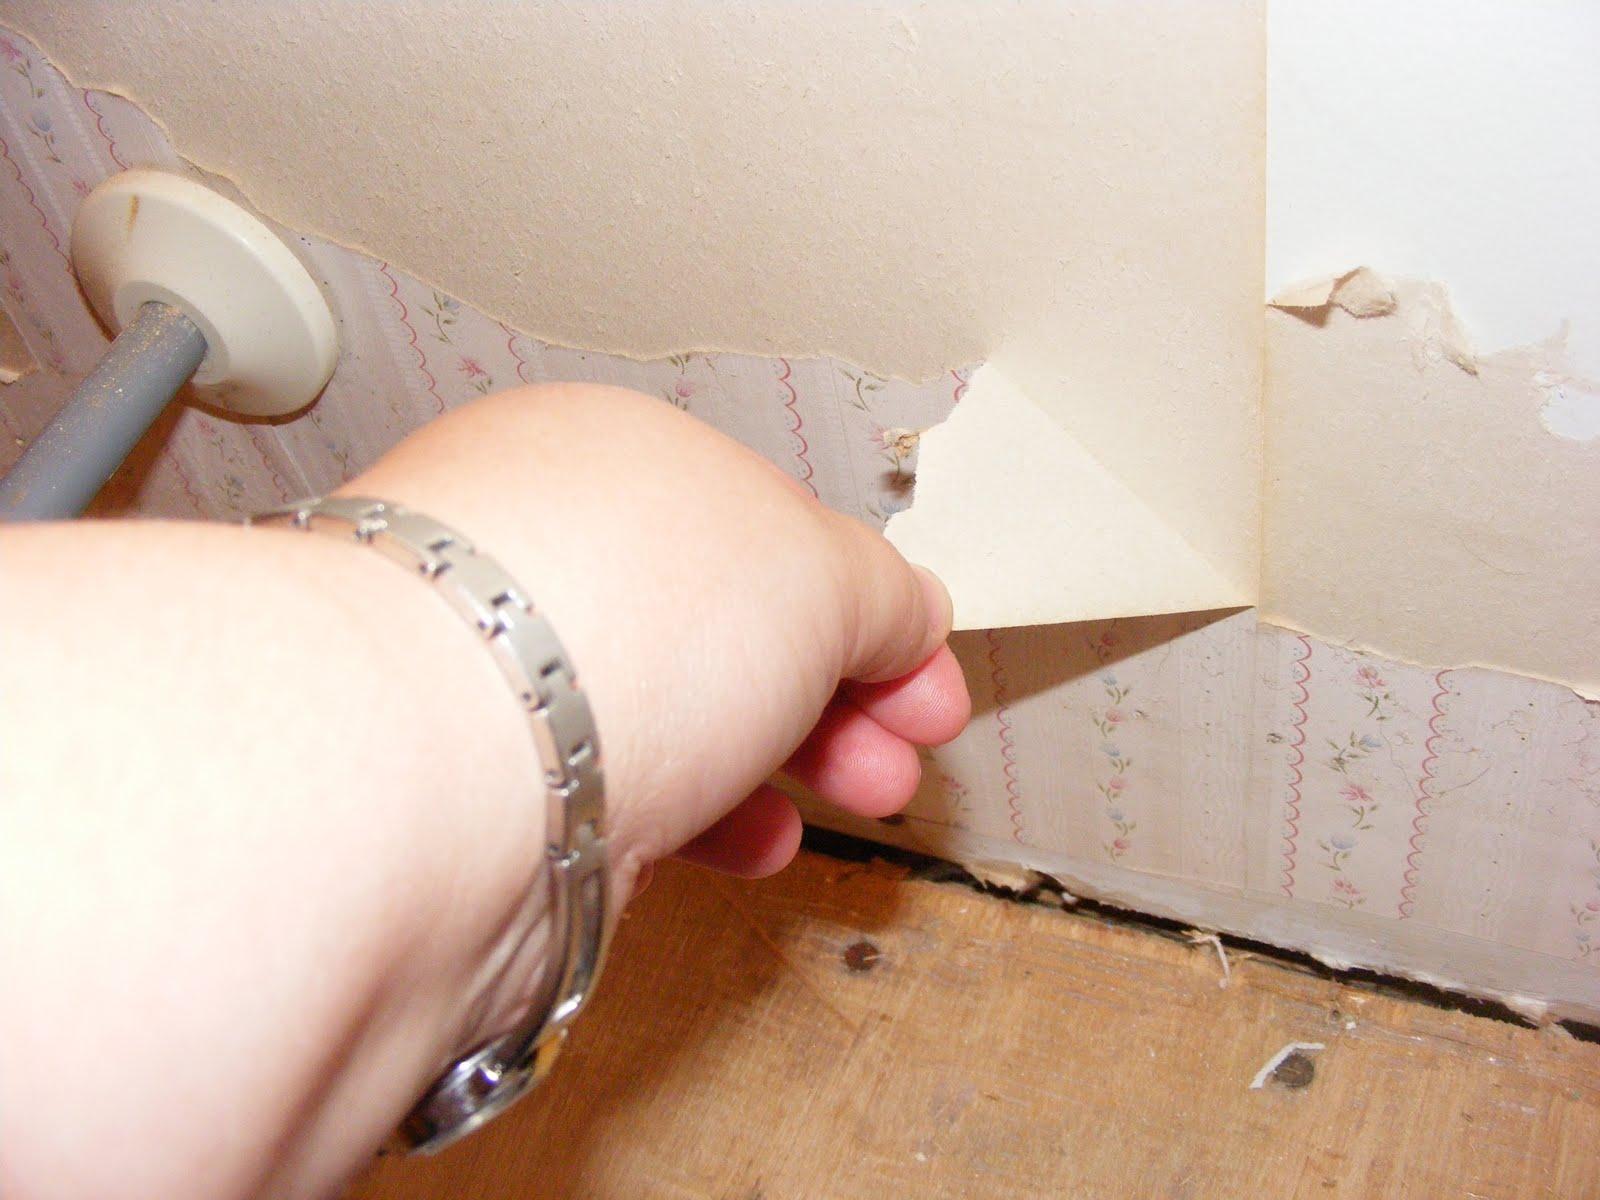 http://2.bp.blogspot.com/_yi1UCscm1z8/TH73CNMBKsI/AAAAAAAABQ8/SLiF2fbhAnI/s1600/DSCF4515.JPG